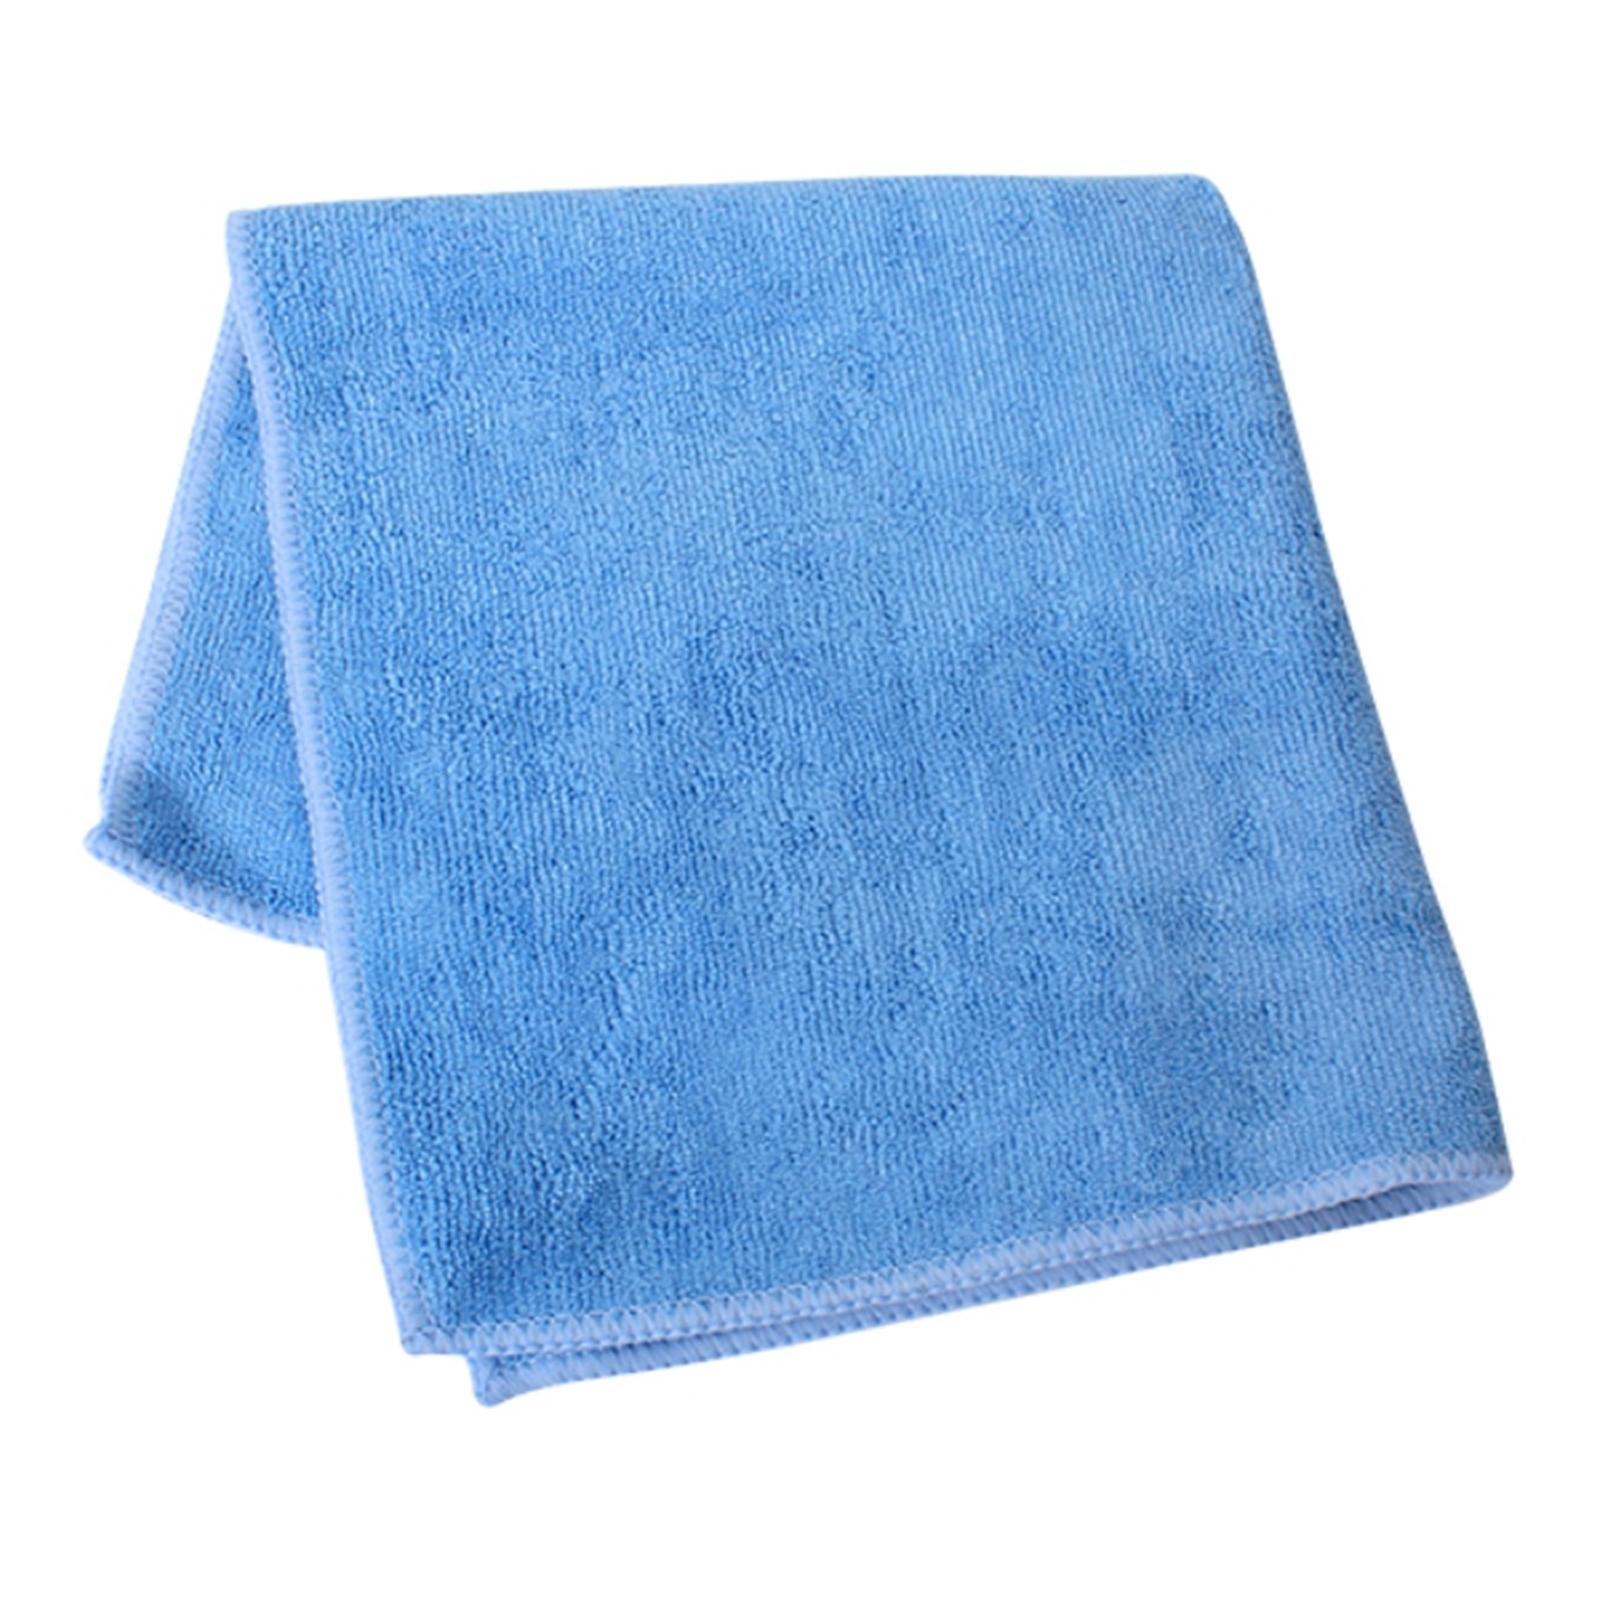 Sabco Blue Microwiz Microfibre Cloth - 5 Pack